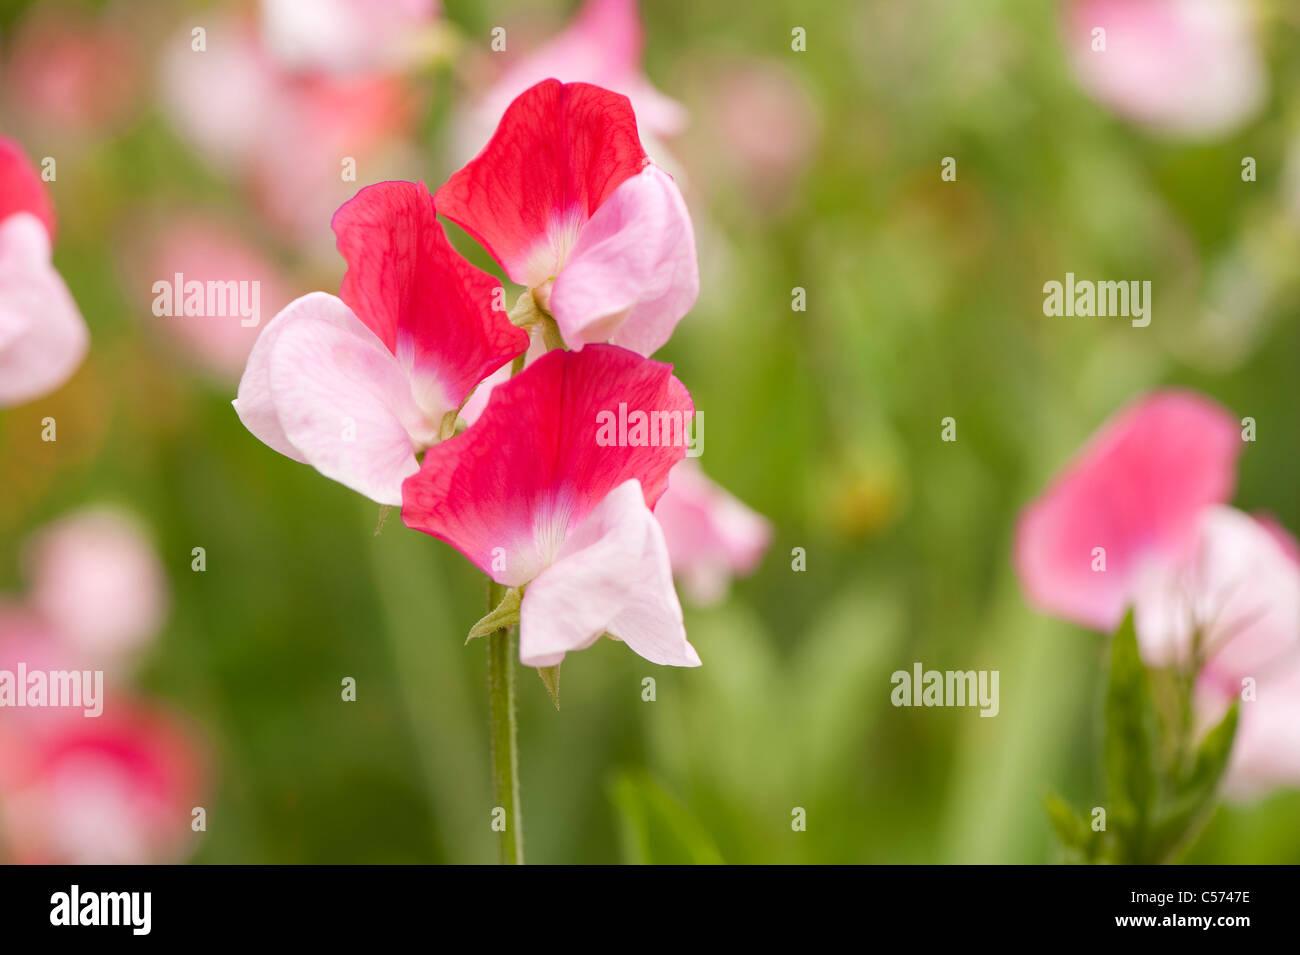 Sweet pea, Lathyrus odoratus 'Painted Lady', in flower - Stock Image